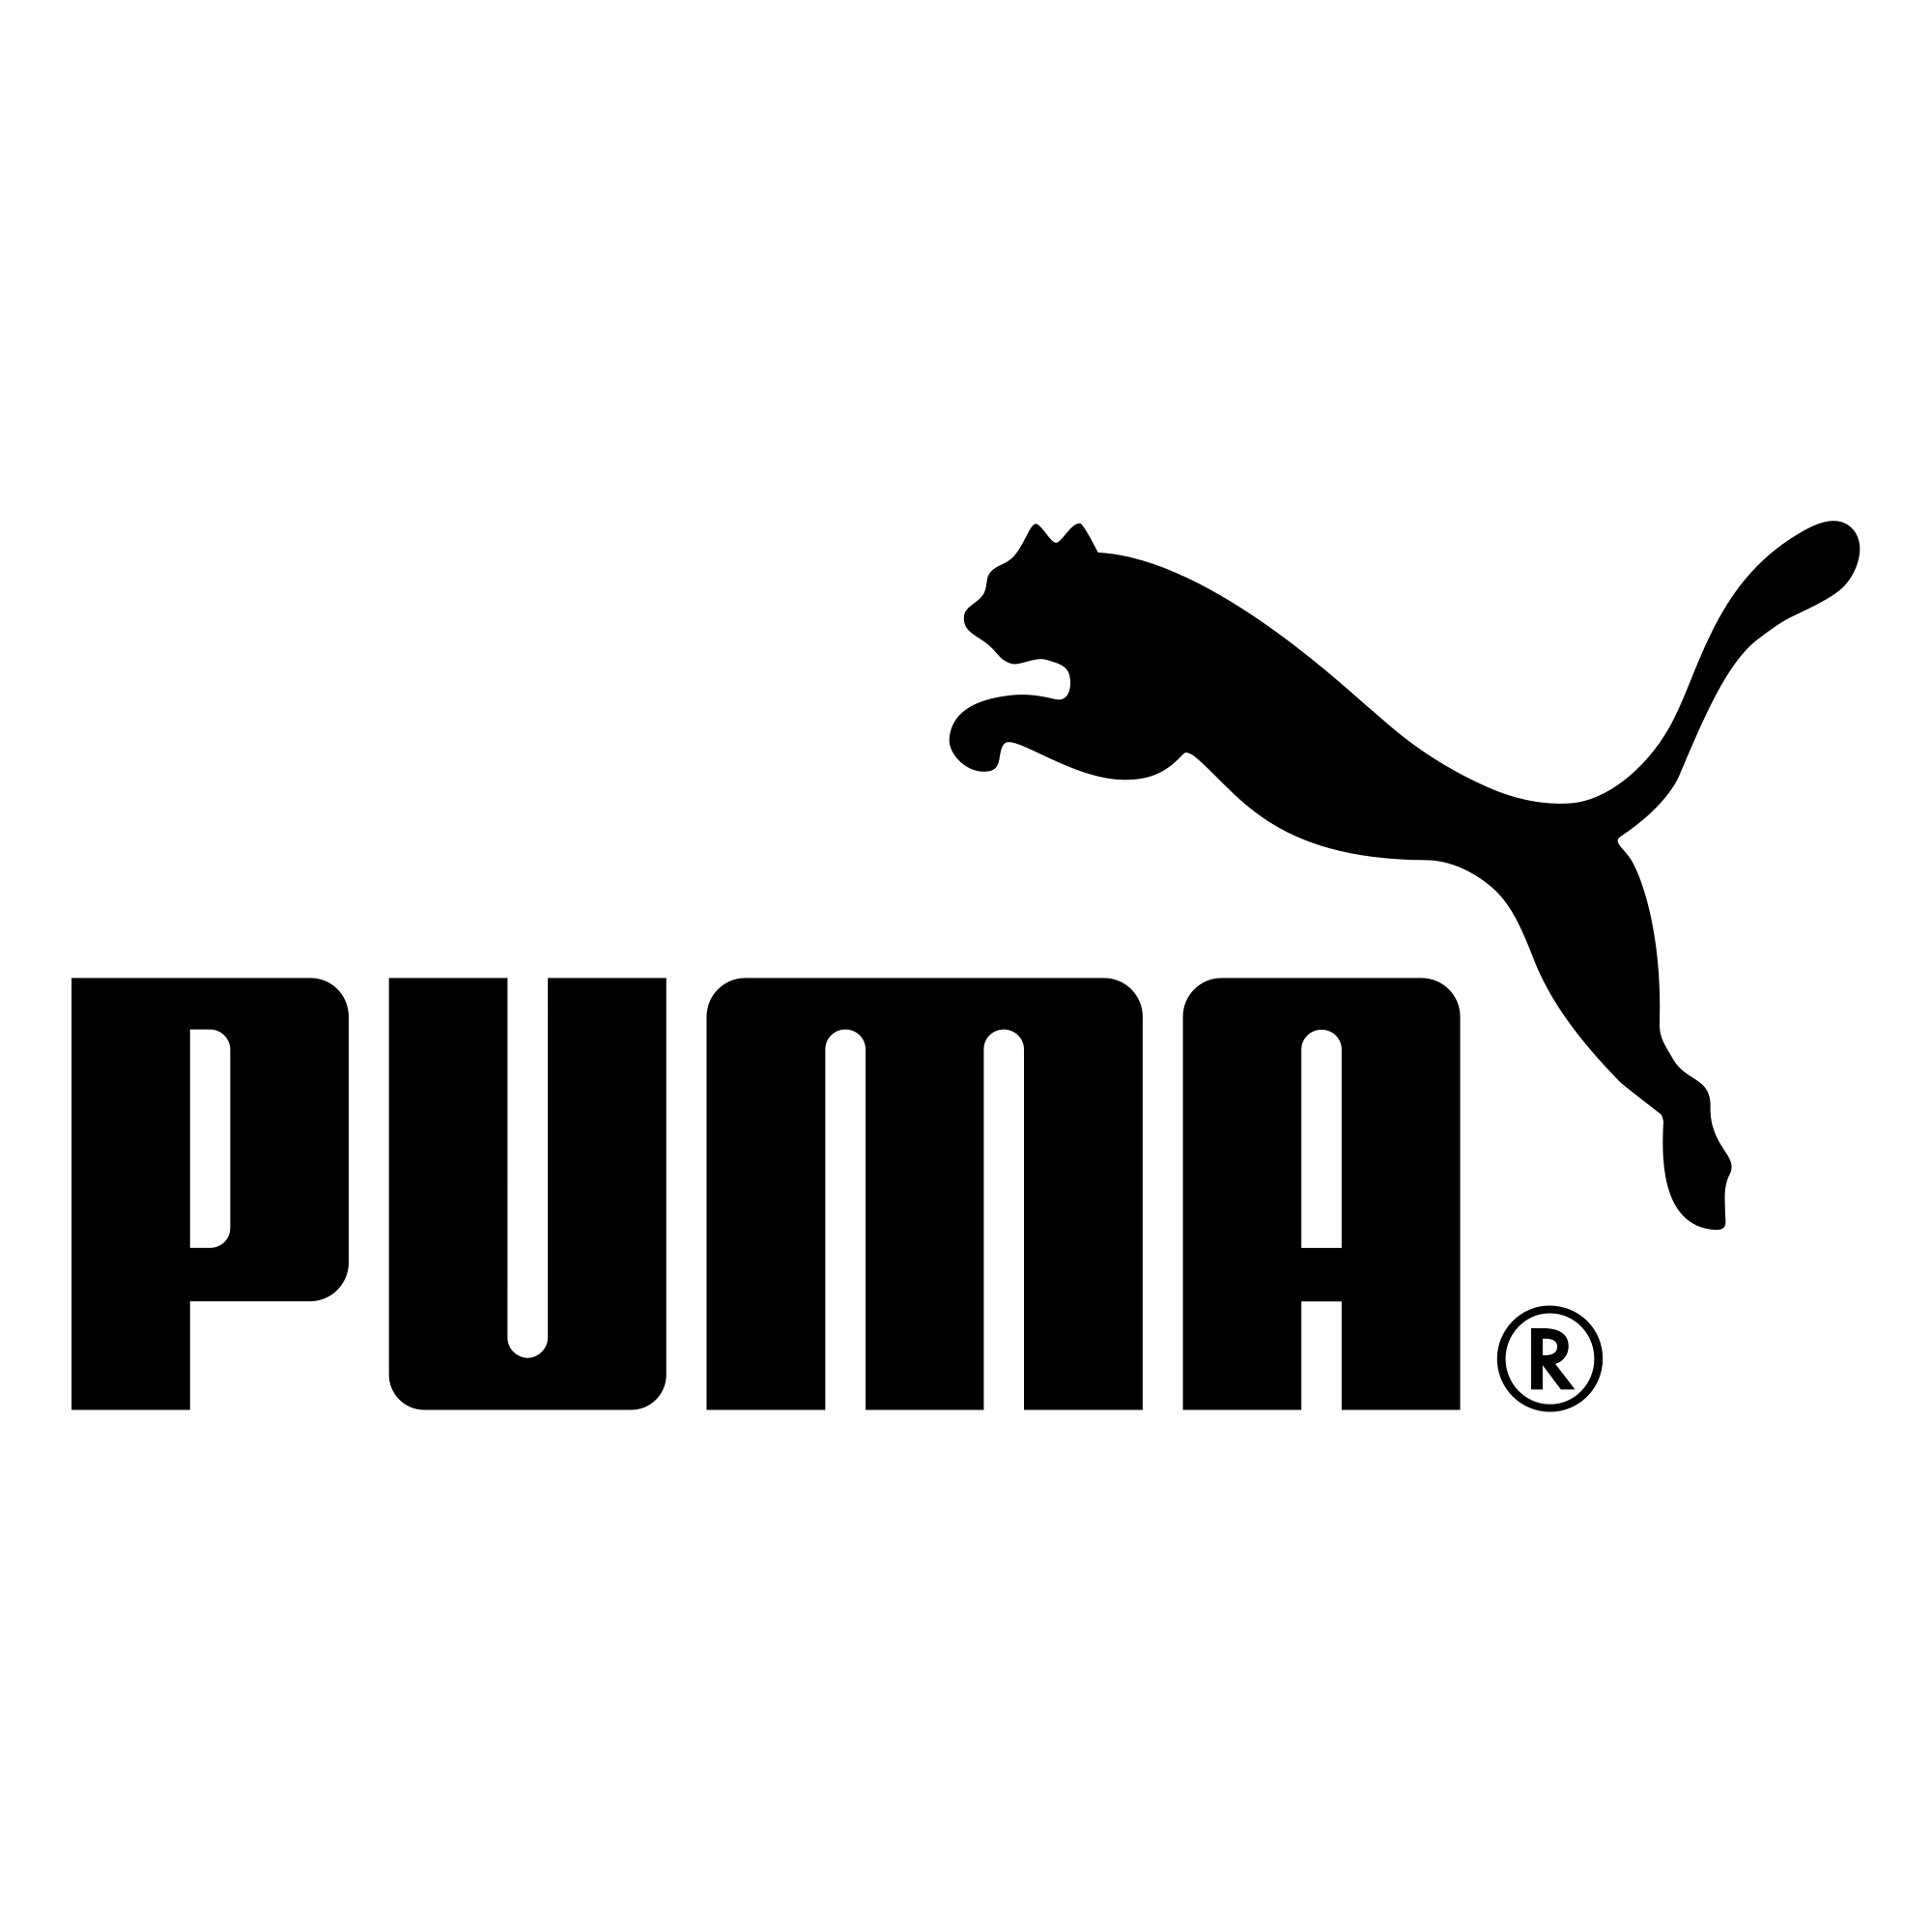 Puma Aktienanalyse | Bilanzanalyse - Fundamentale Aktienanalyse